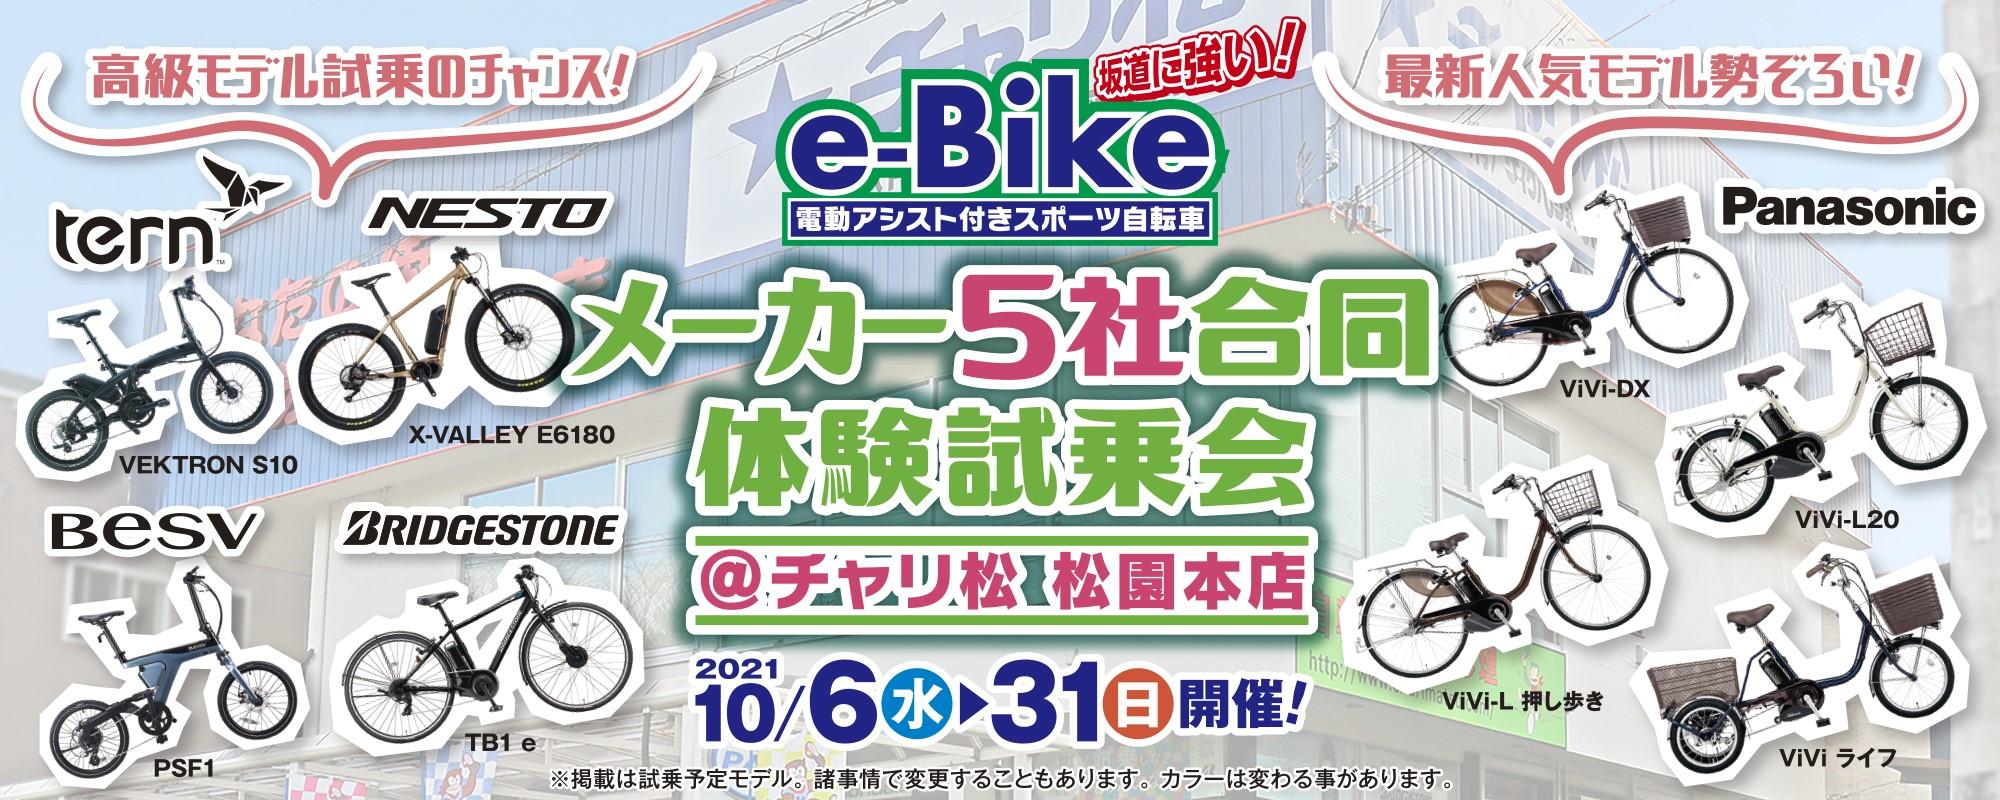 ebike体験試乗会